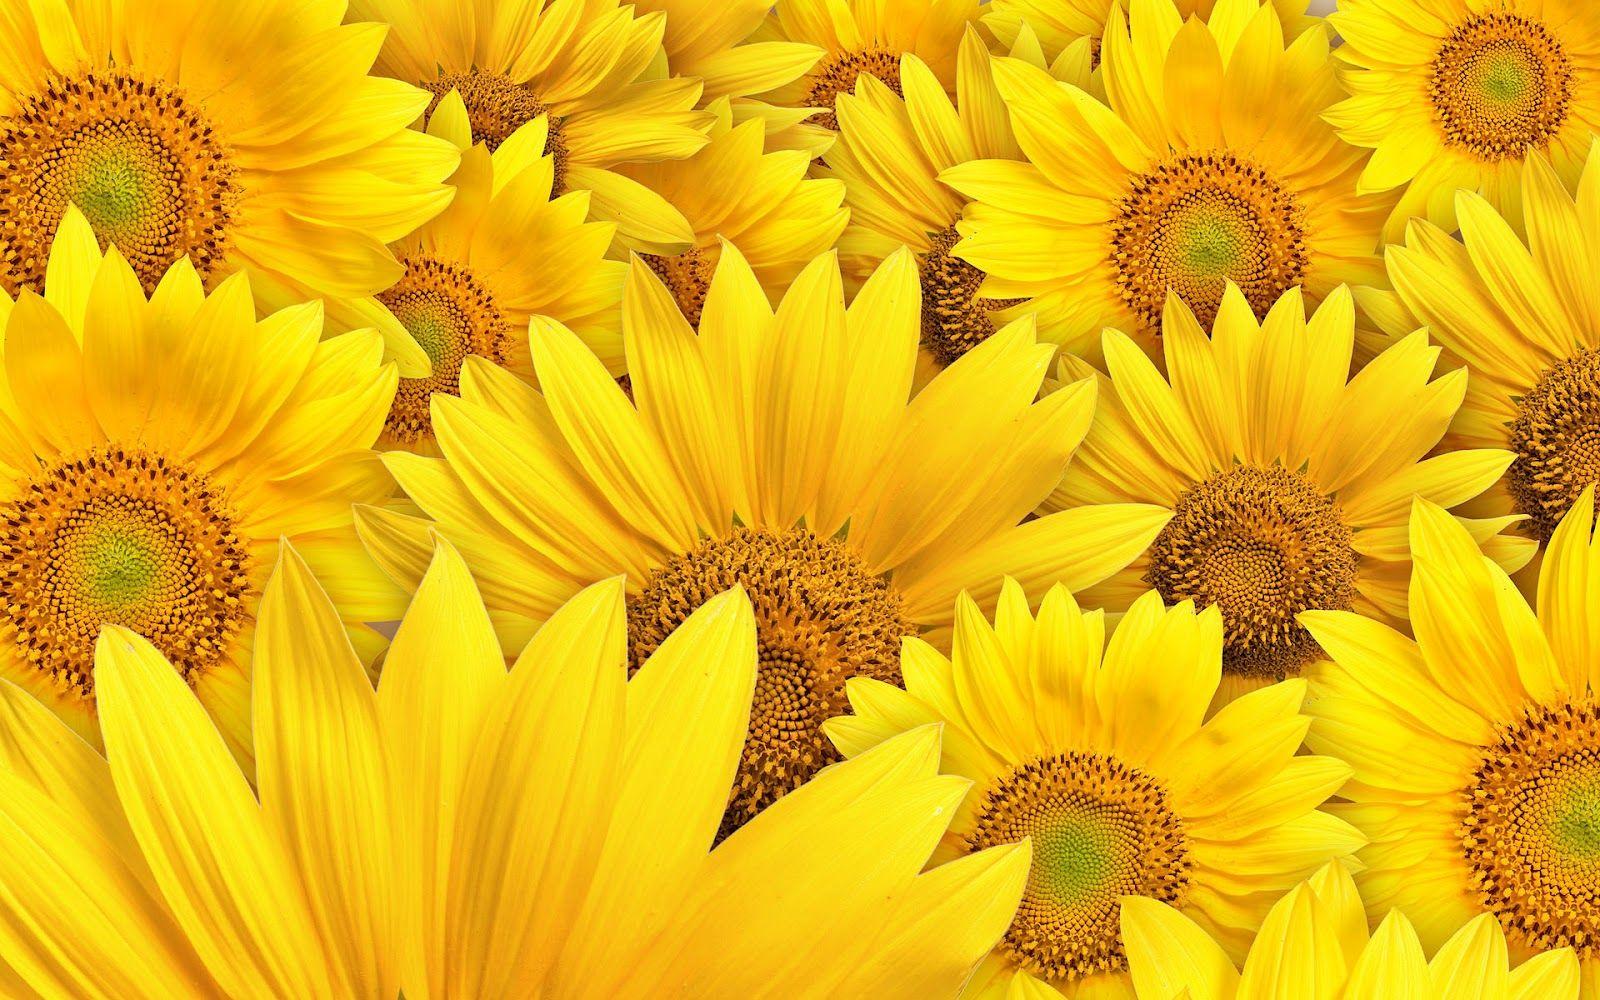 Sunflower Computer Wallpaper Bing images